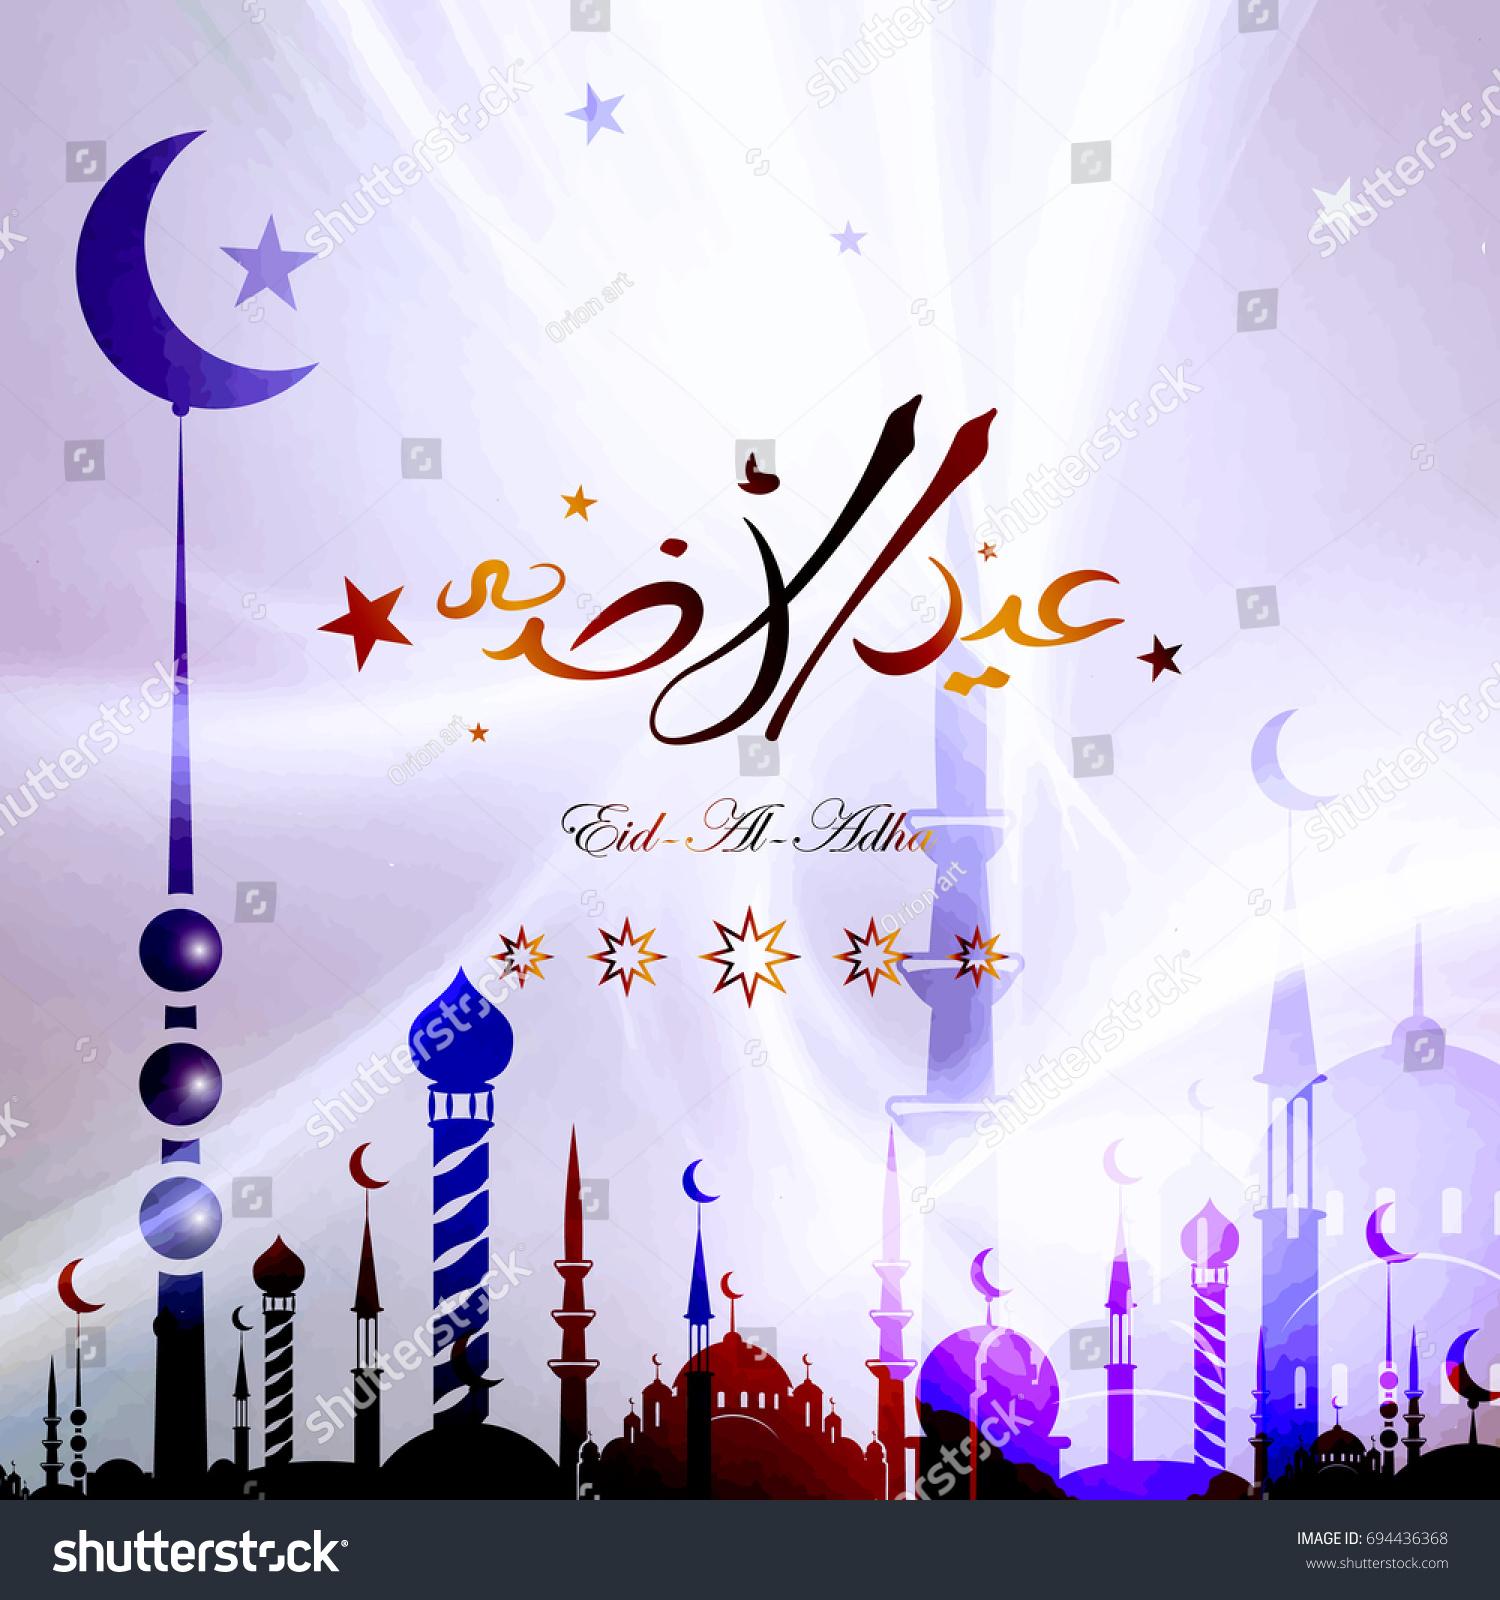 Eid Al Adha Greeting Cards Religious Stock Illustration 694436368